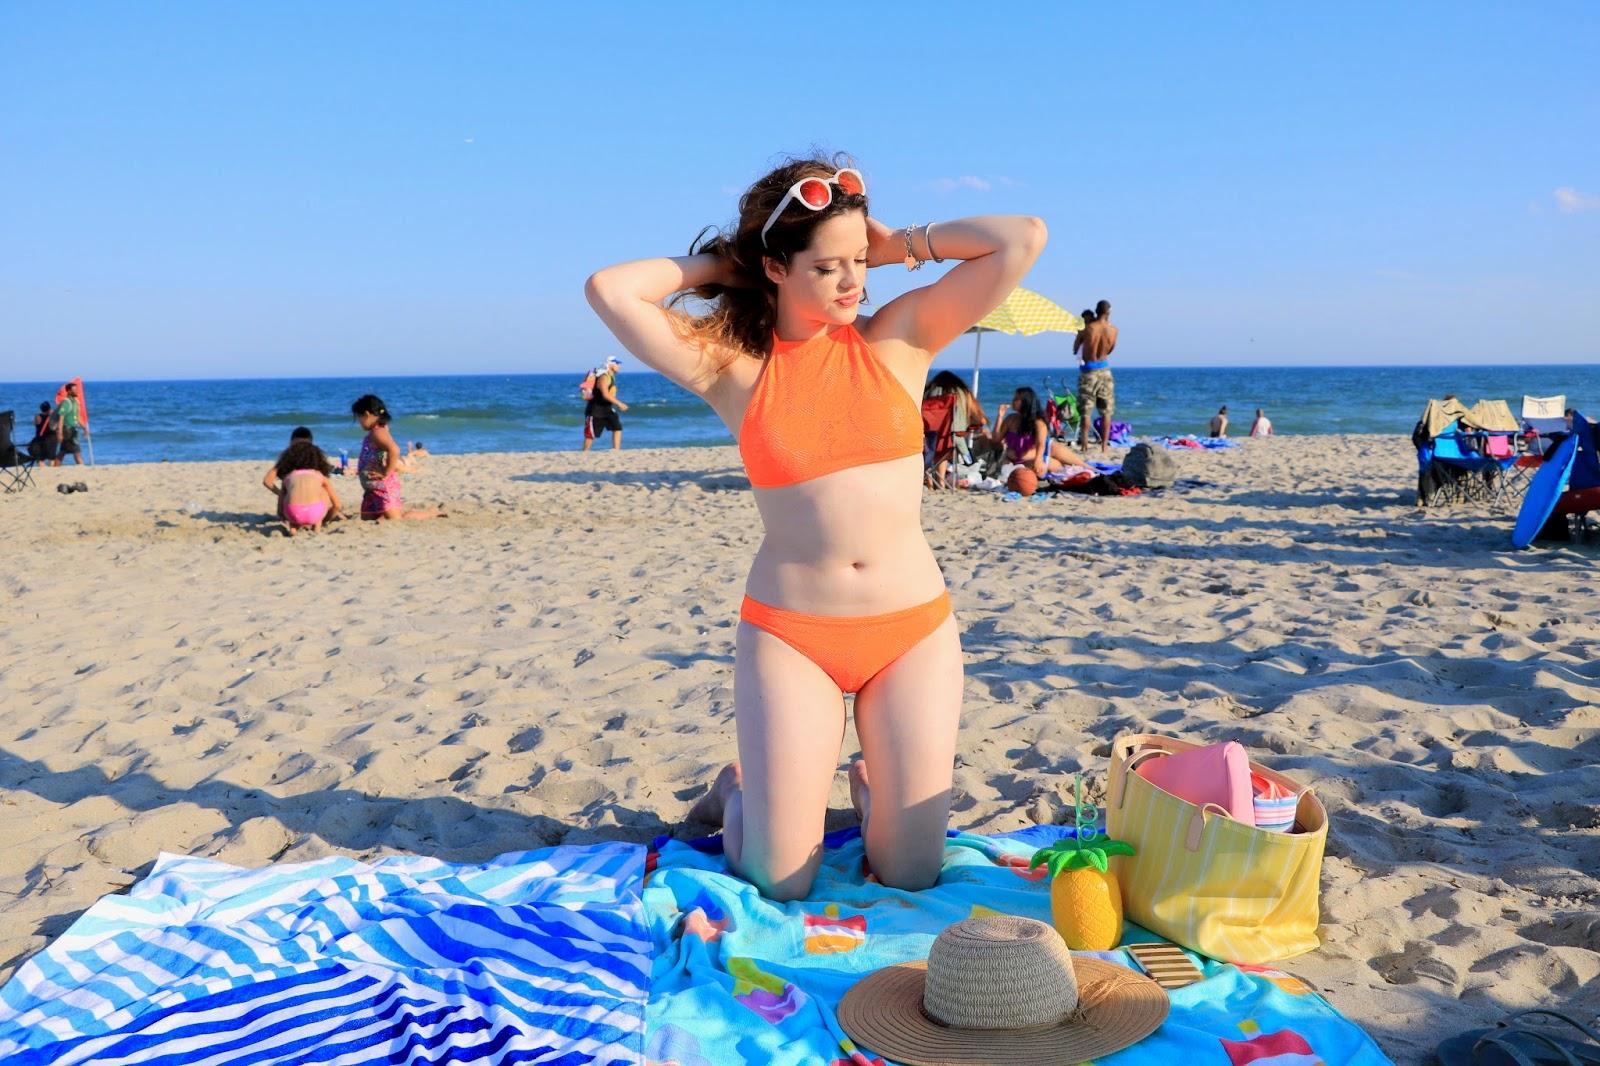 NYC Fashion blogger Kathleen Harper showing off summer beach style